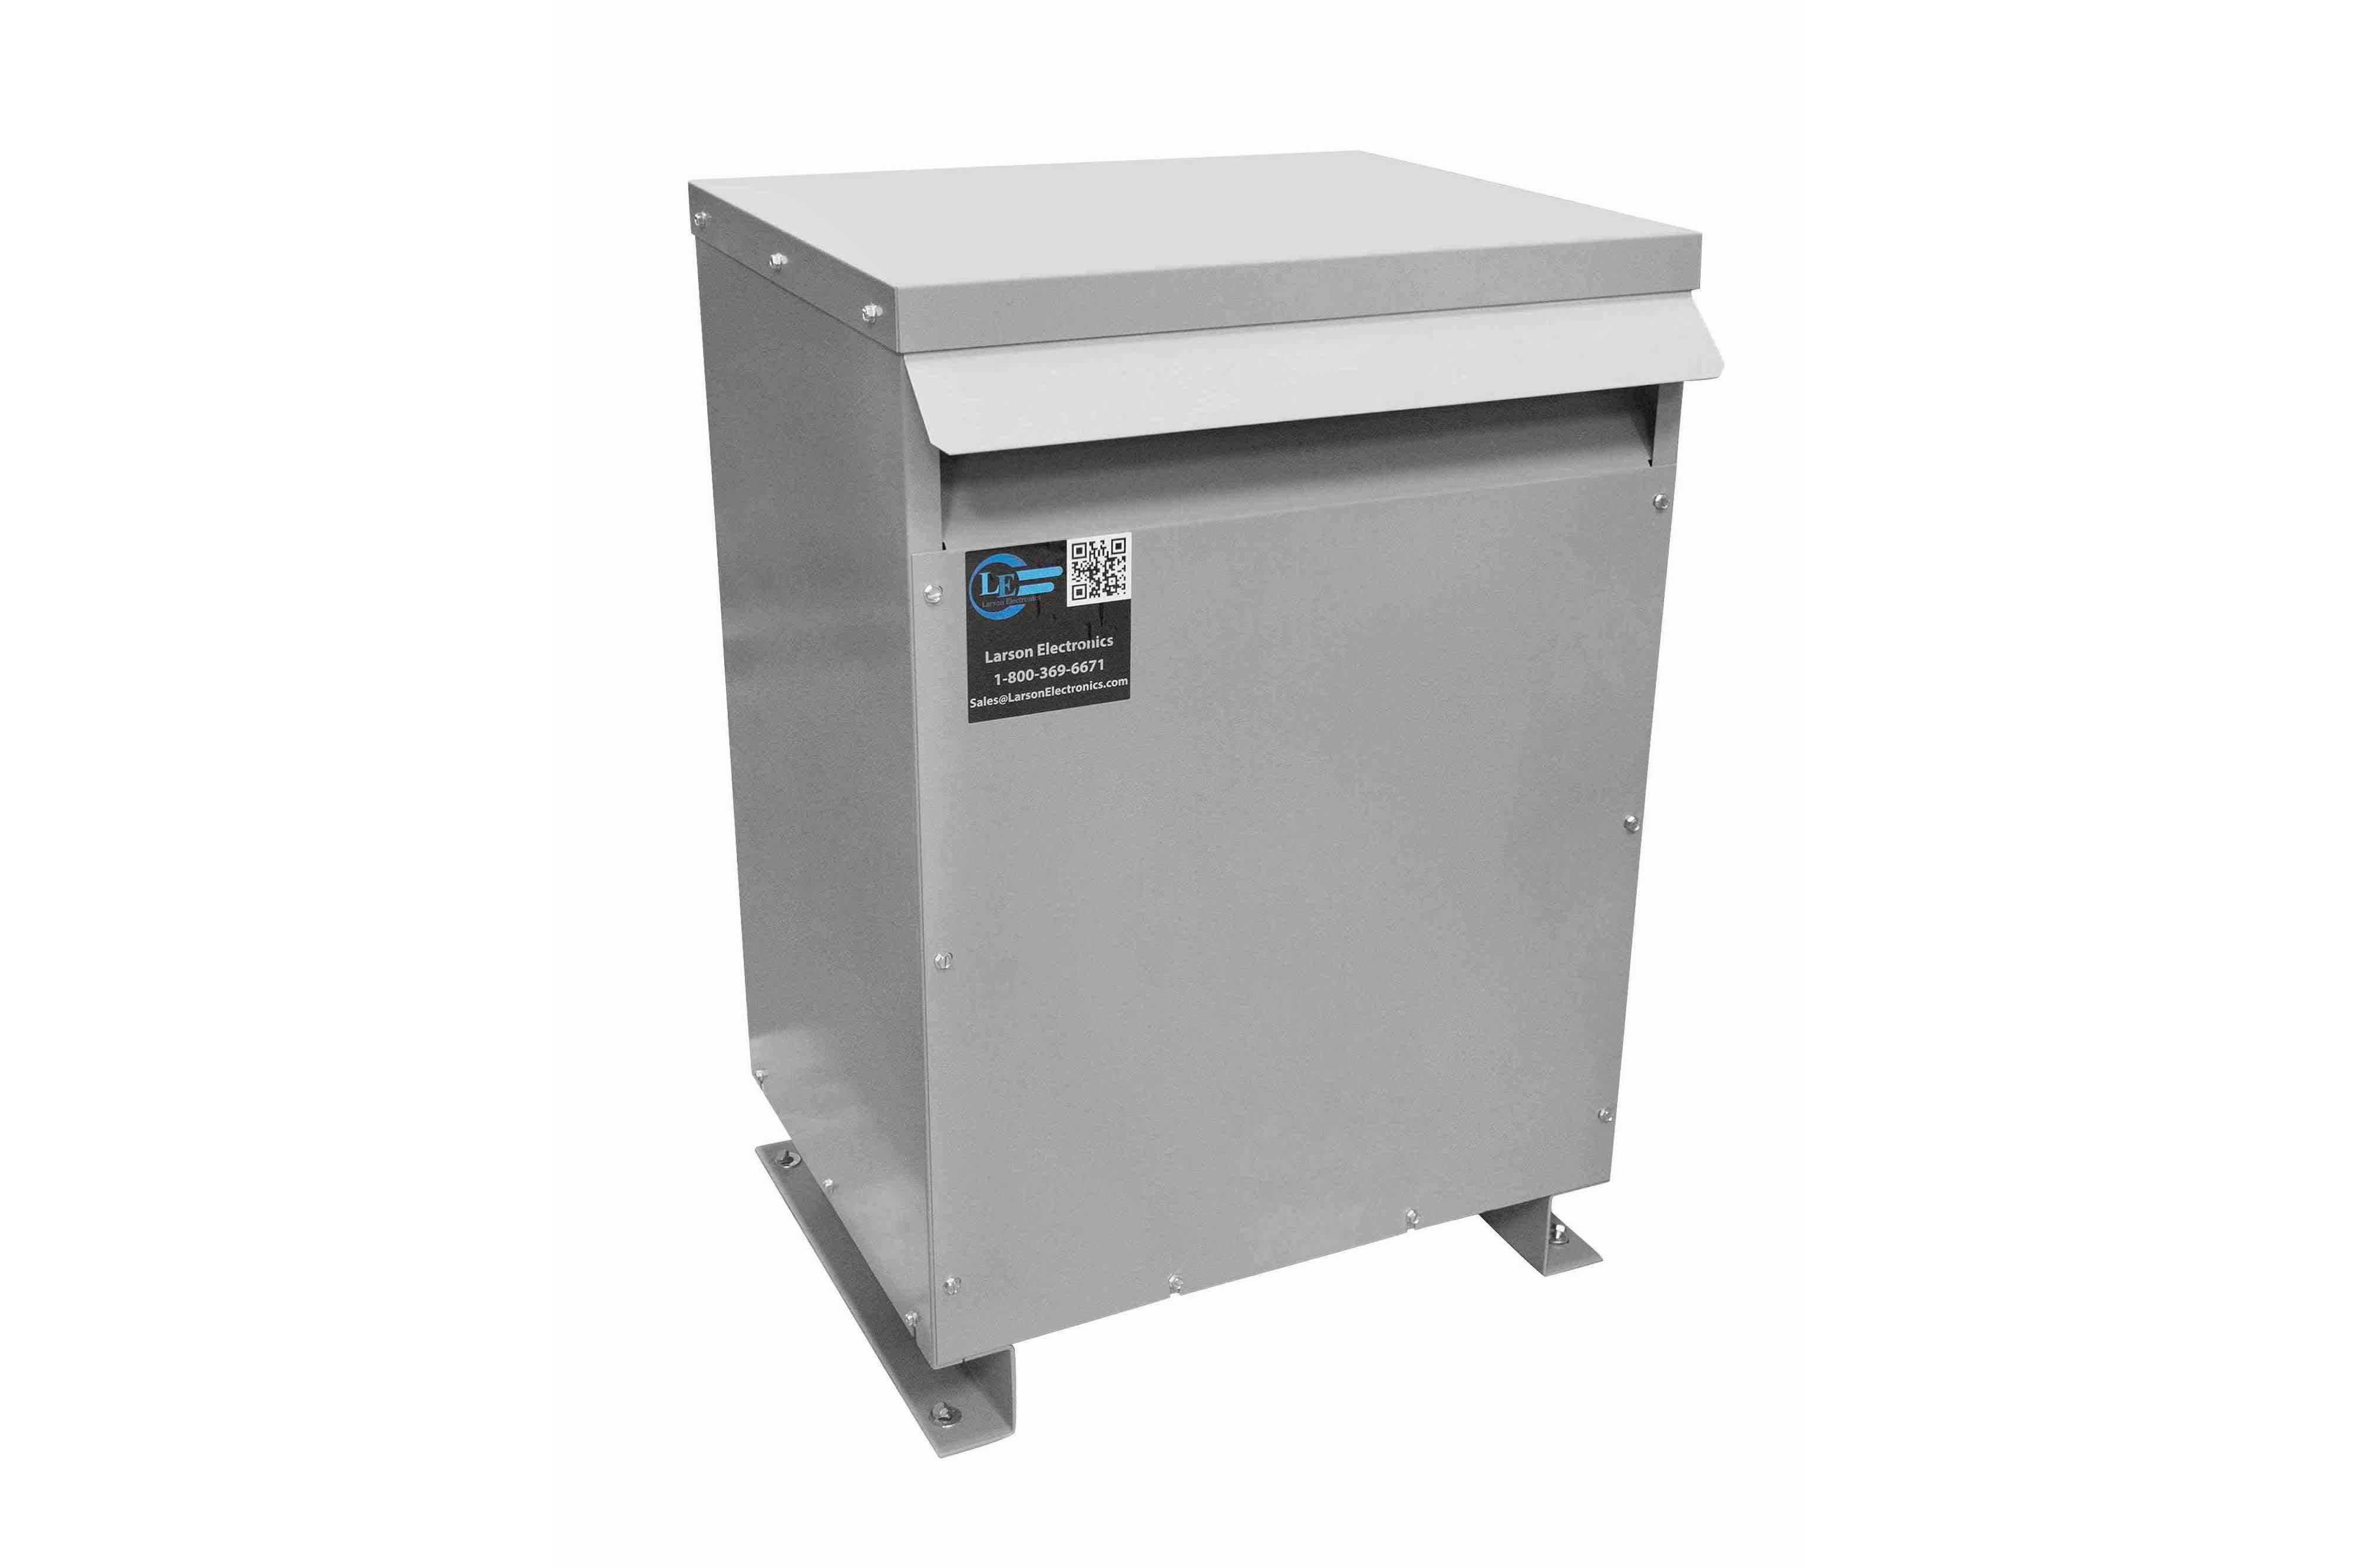 75 kVA 3PH Isolation Transformer, 220V Wye Primary, 480V Delta Secondary, N3R, Ventilated, 60 Hz